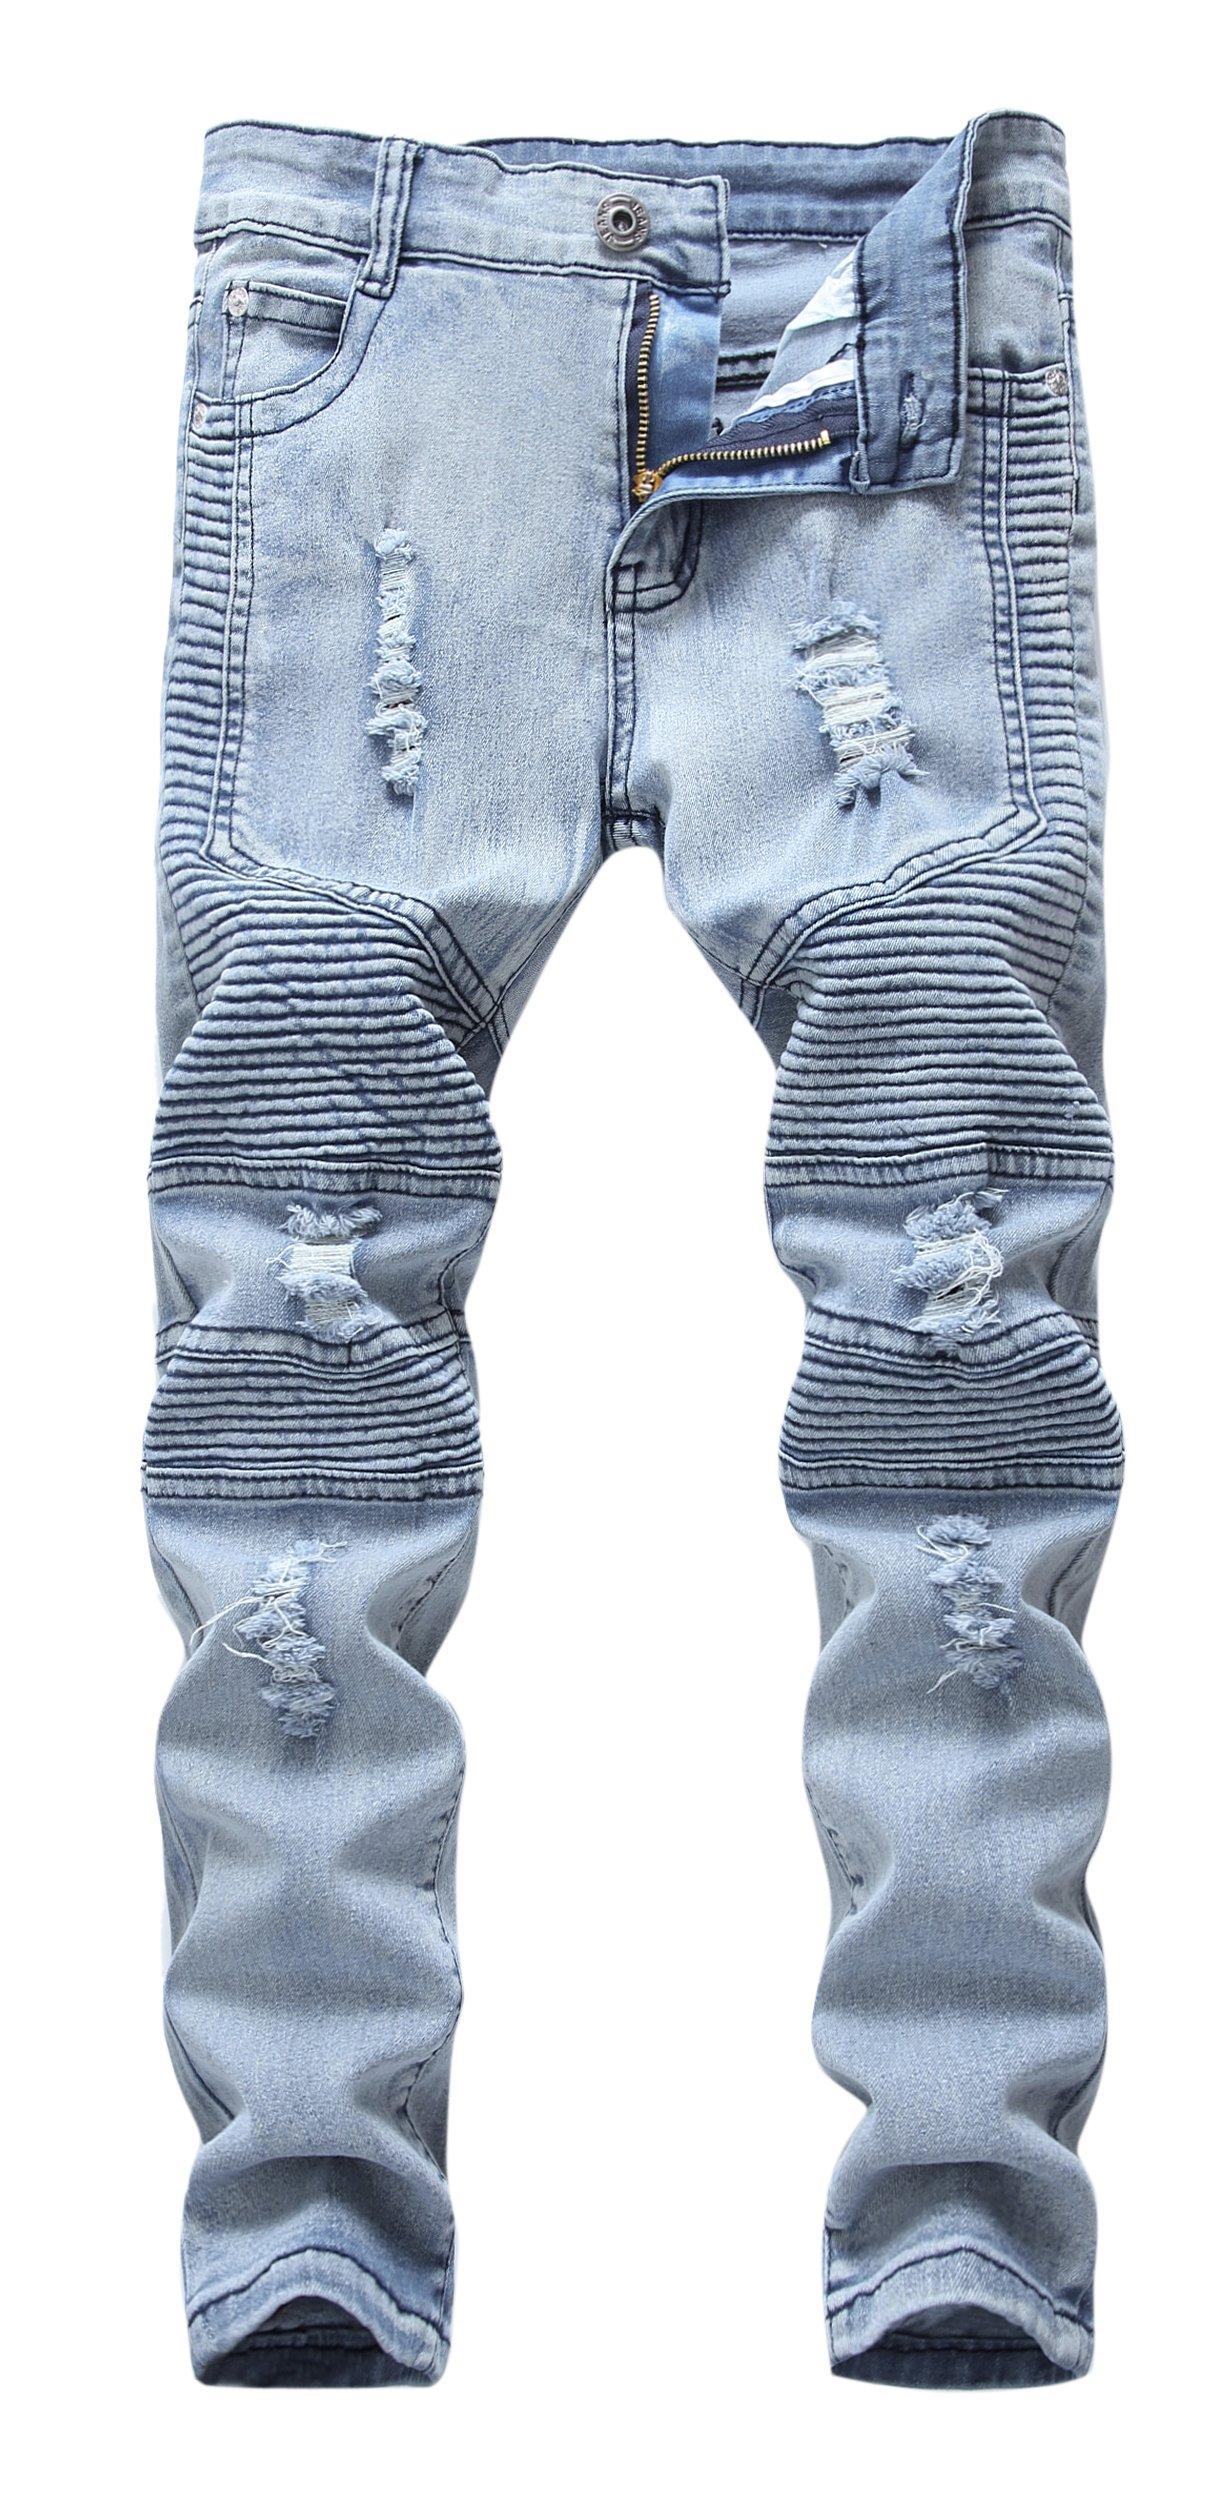 FREDD MARSHALL Boys Stylish Moto Biker Skinny Ripped Wrinkled Stretch Fit Light Blue Denim Jeans,Light Blue,12